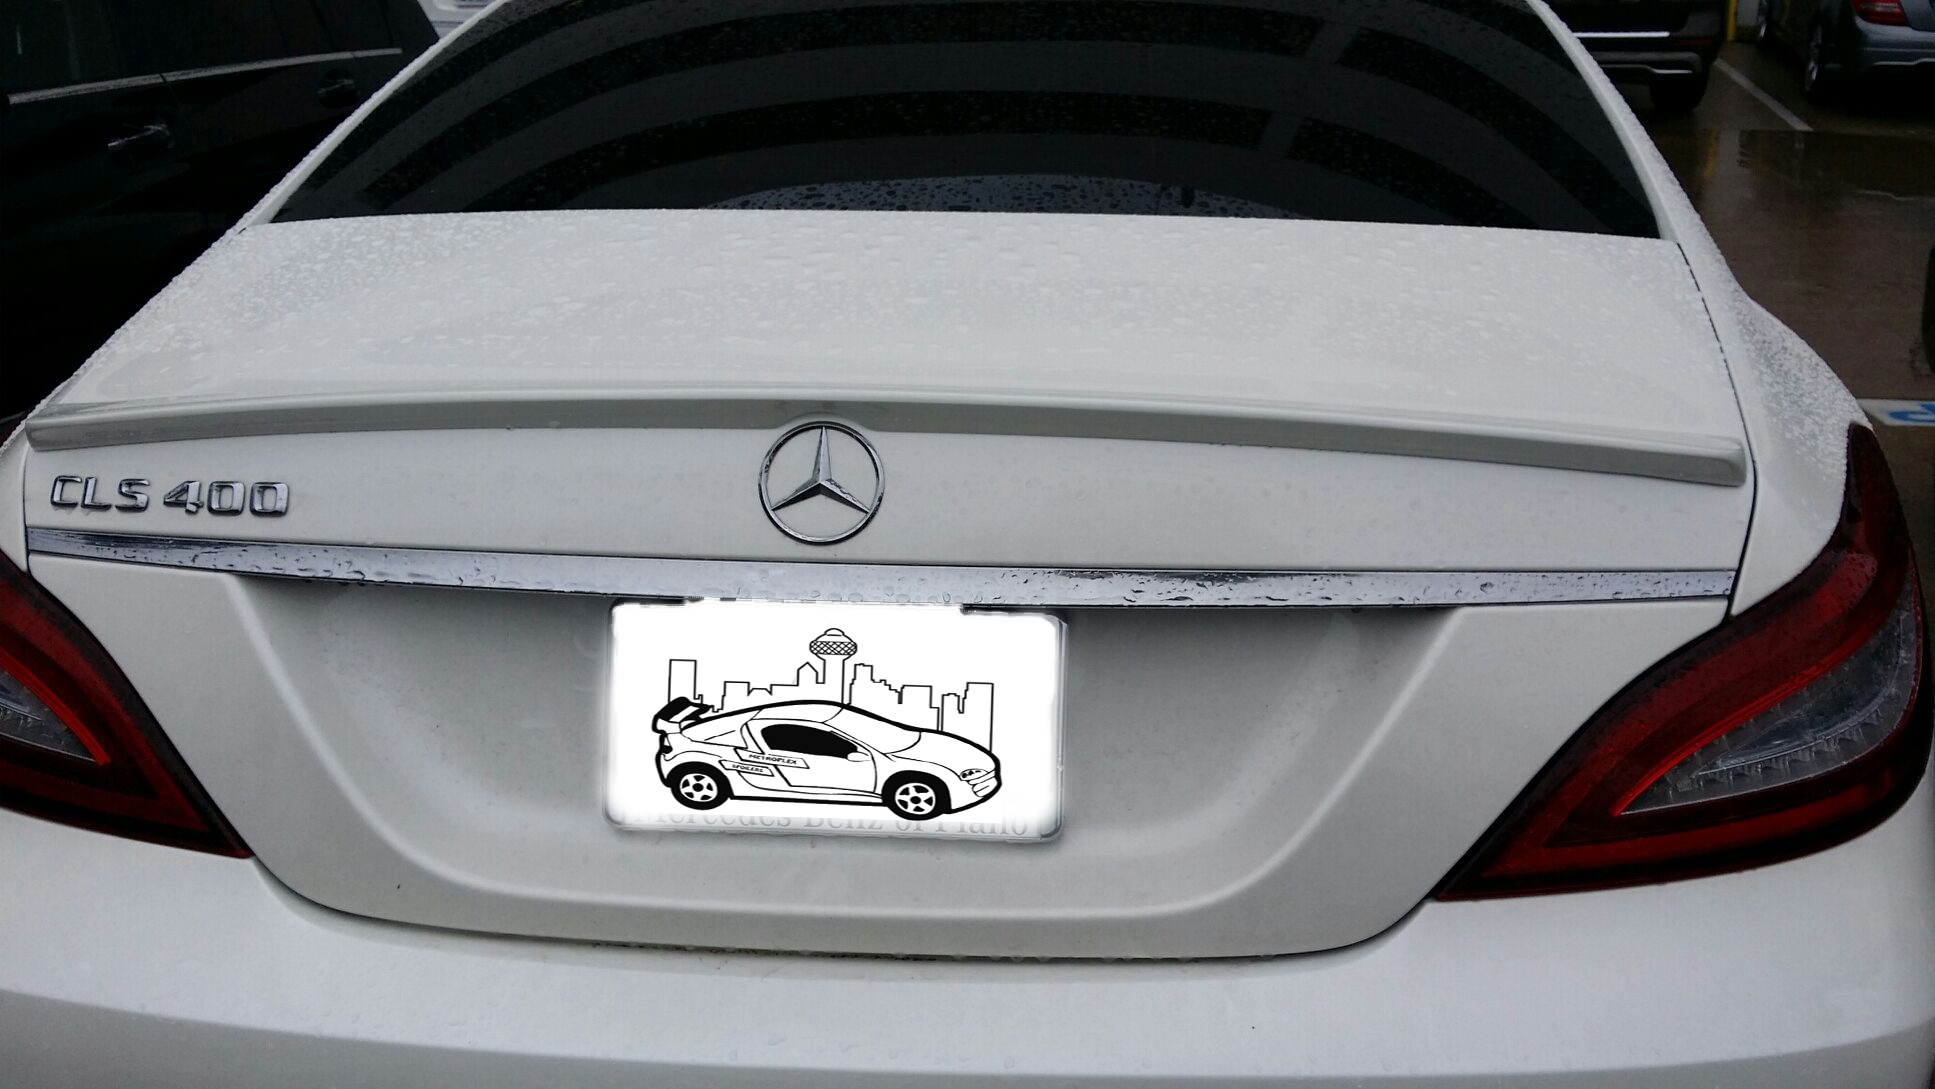 2012+ Mercedes CLS Factory Style Flush Mount Spoiler